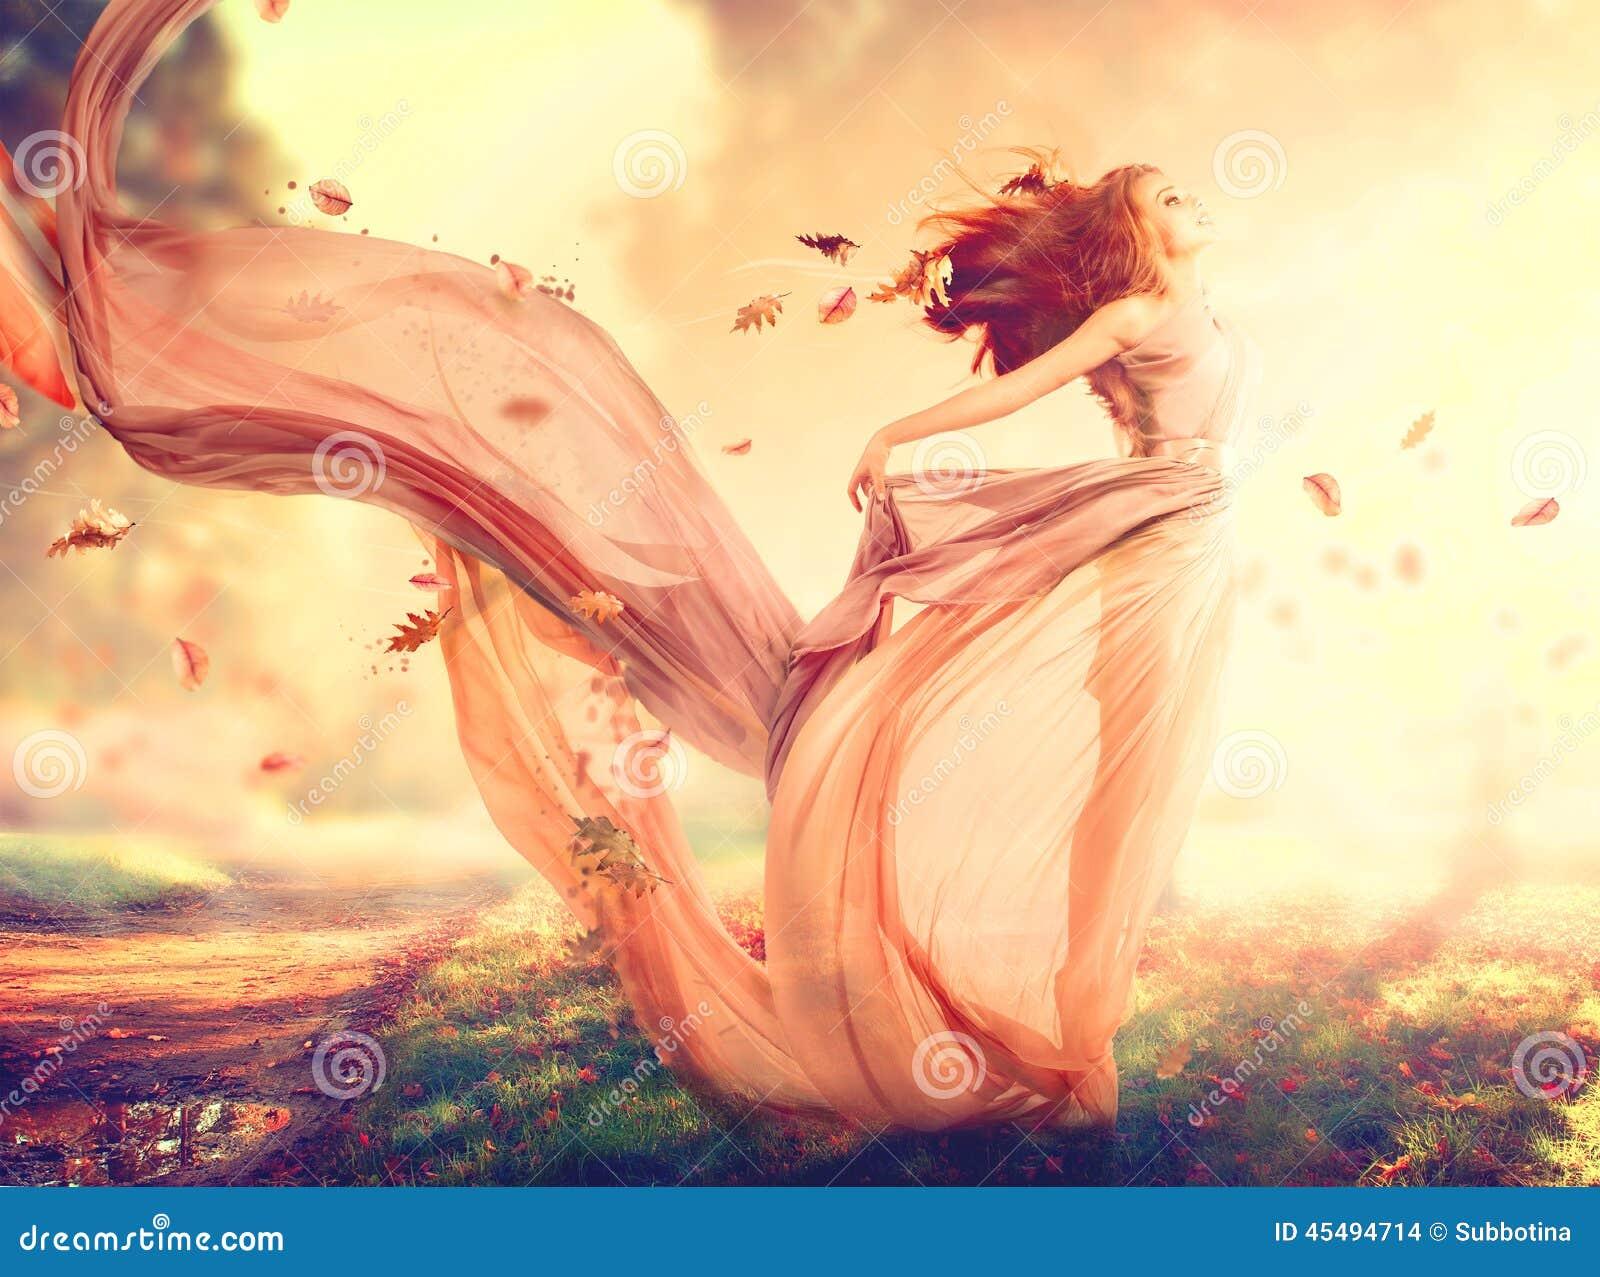 Autumn fantasy girl